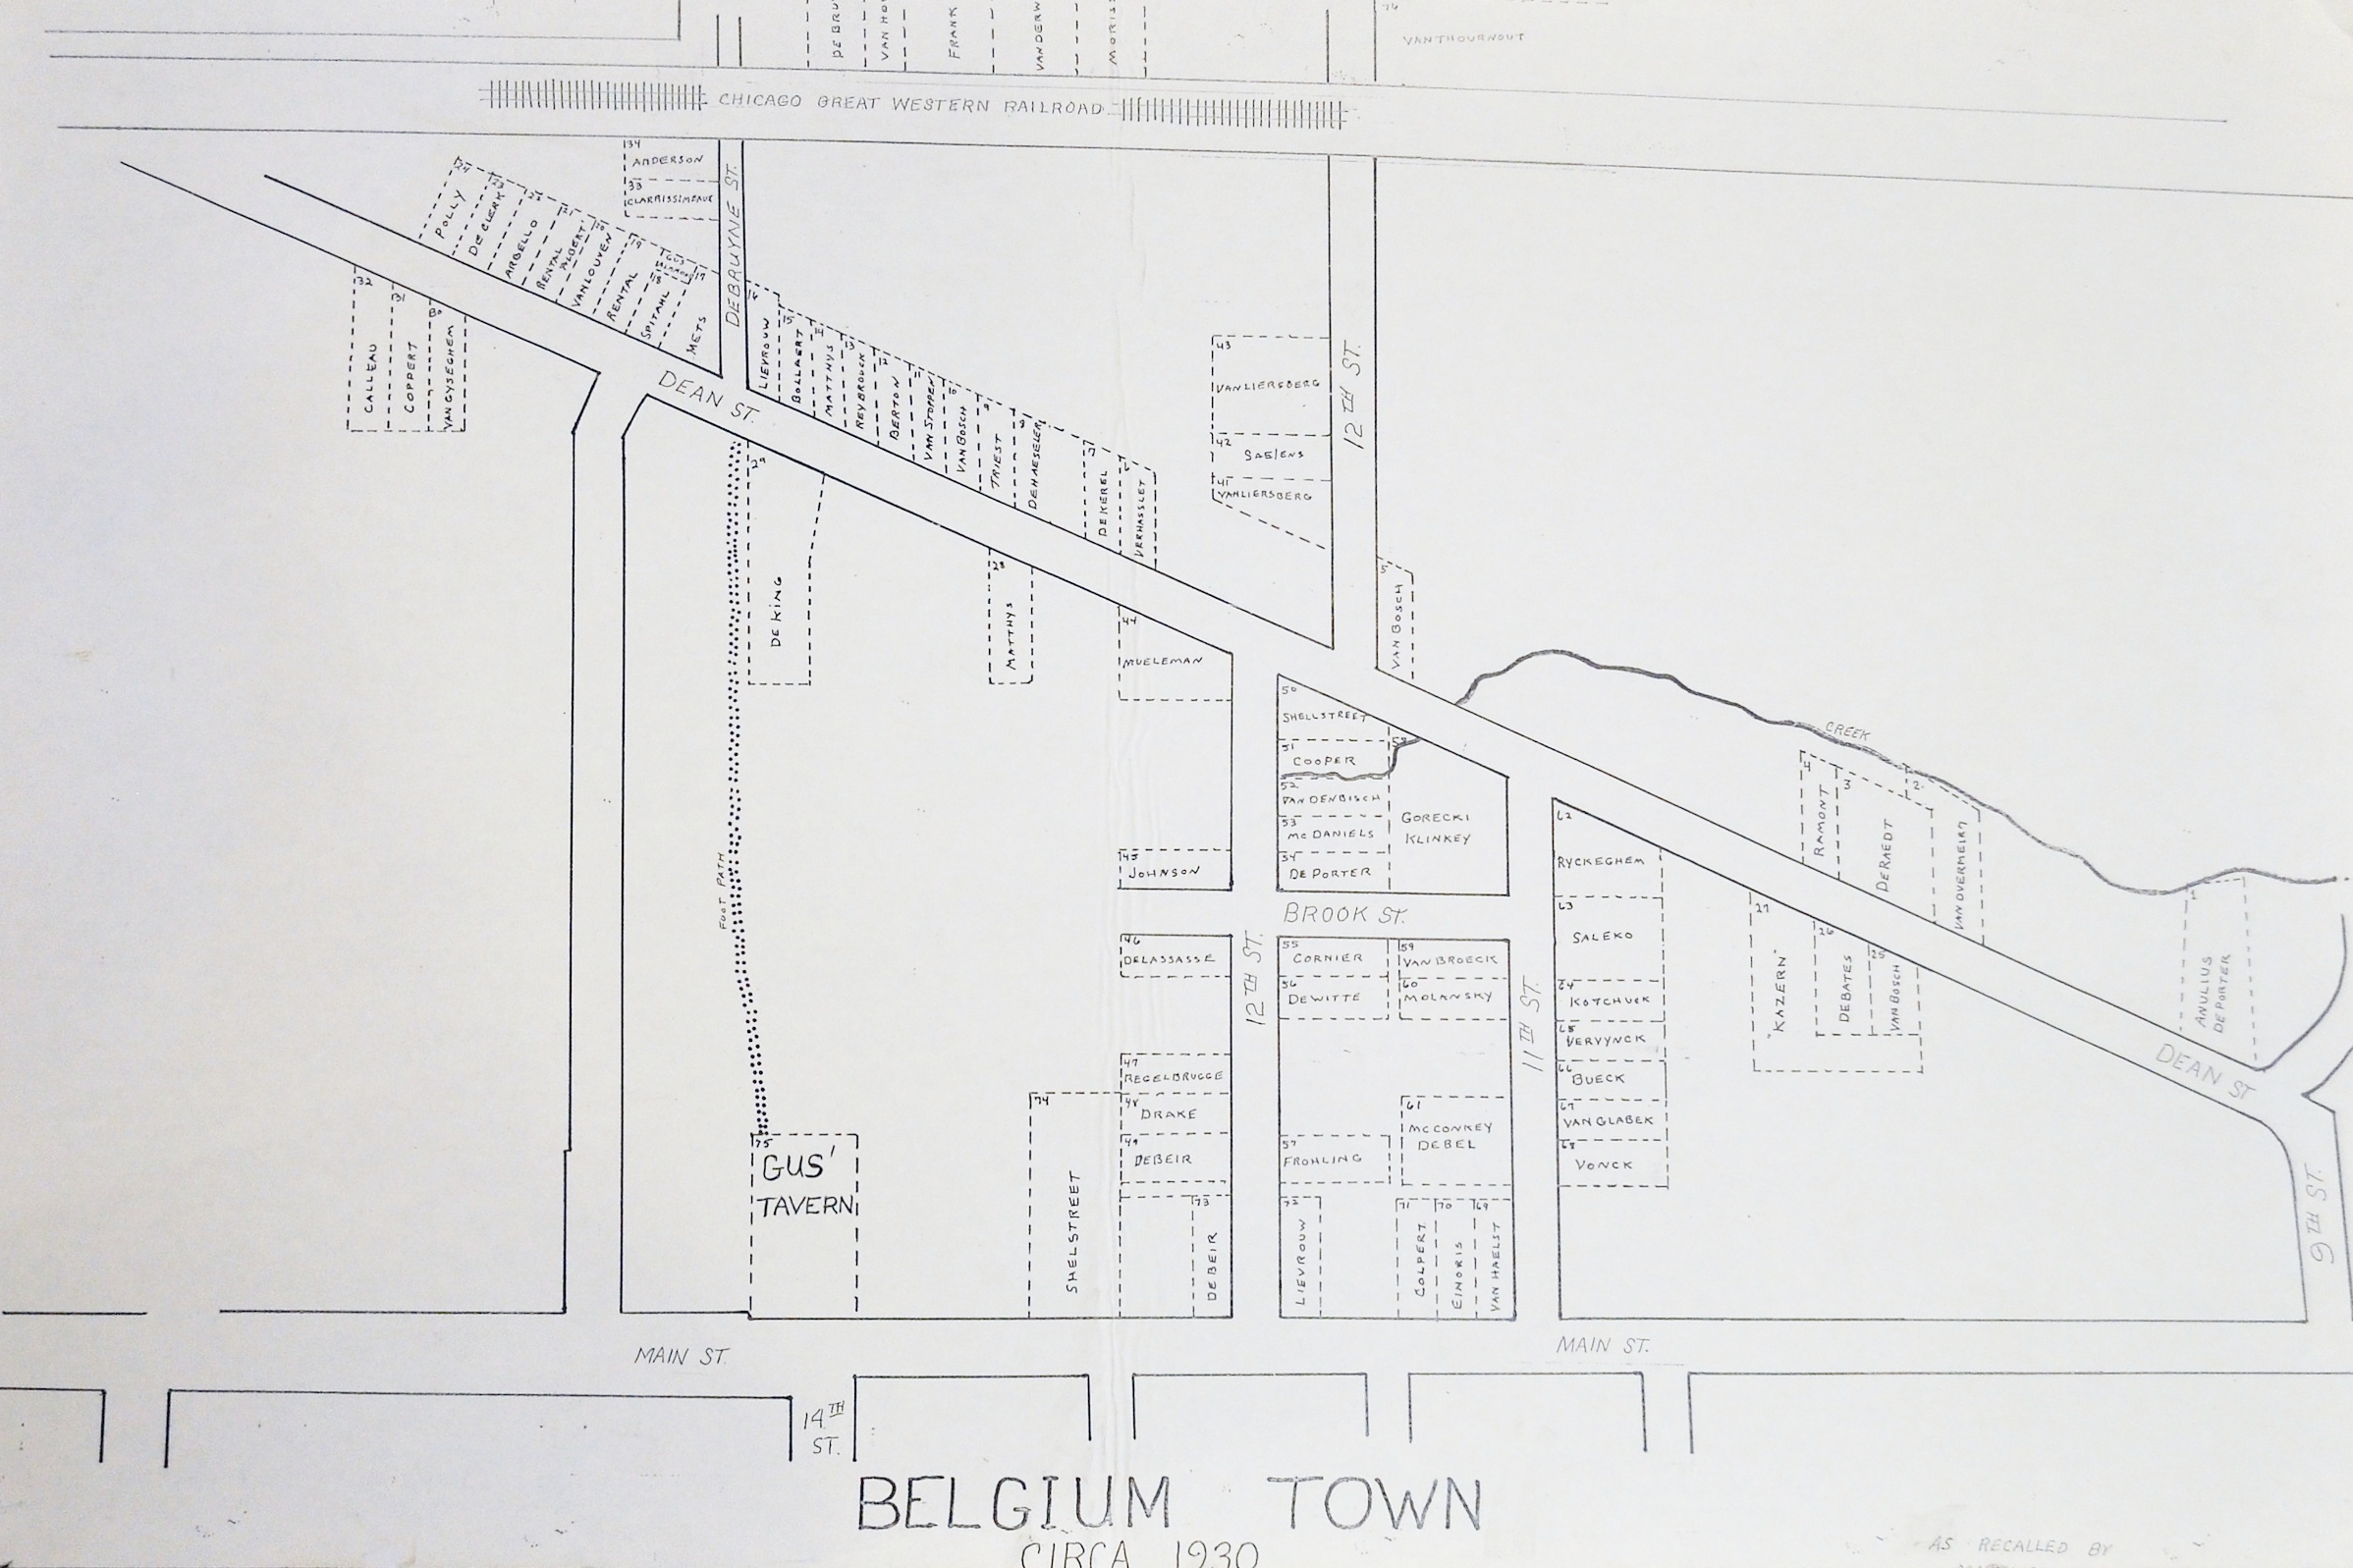 Belgium Town Map, c. 1930.